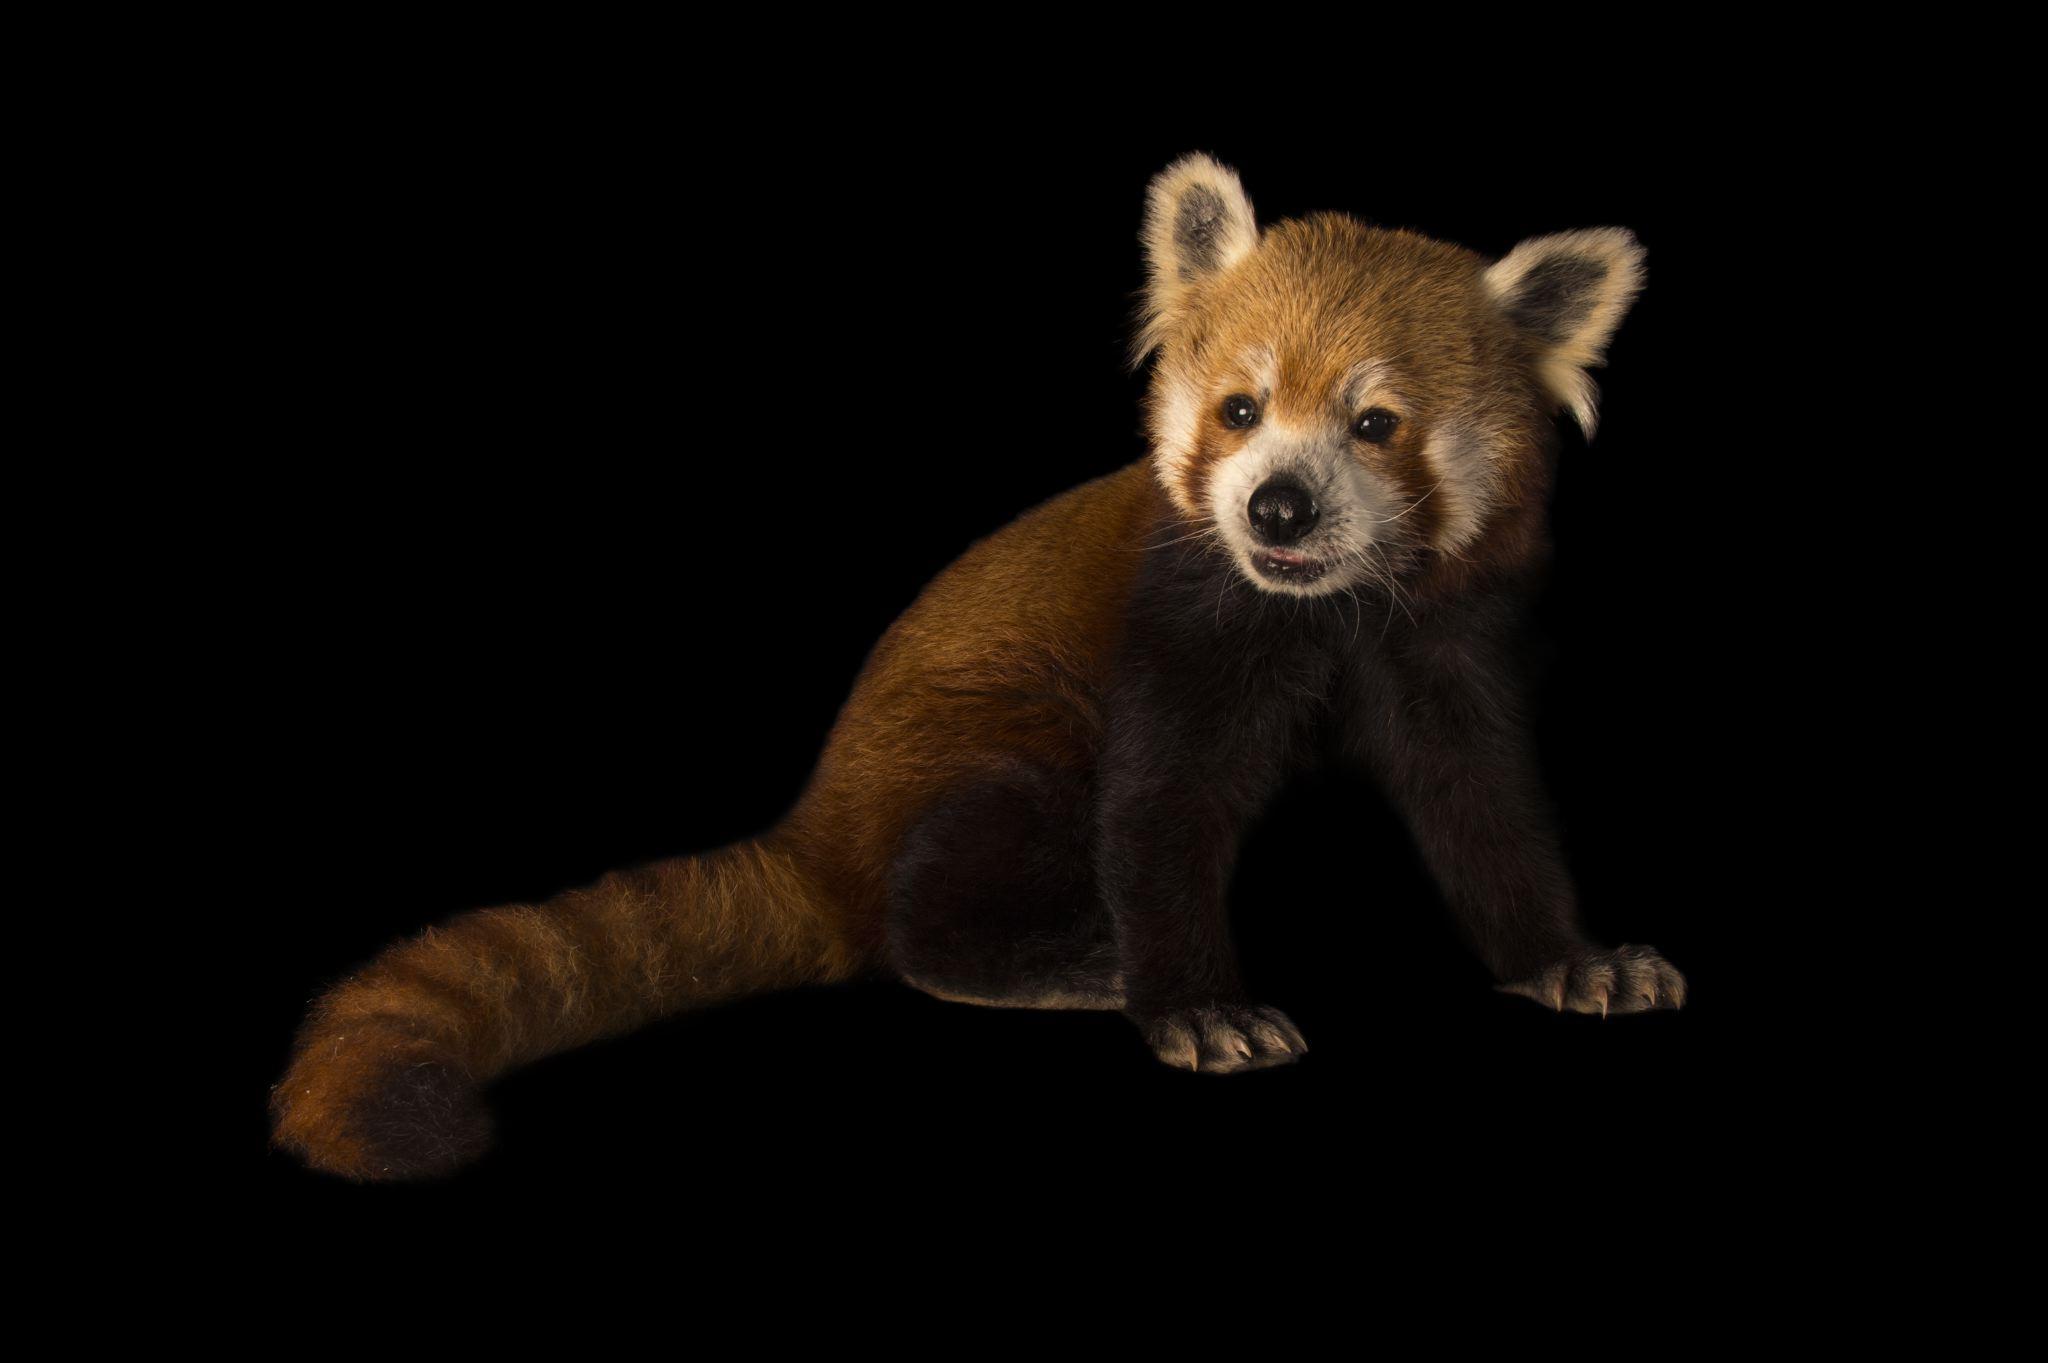 Drawn red panda national geographic Pics Panda 76 Red National